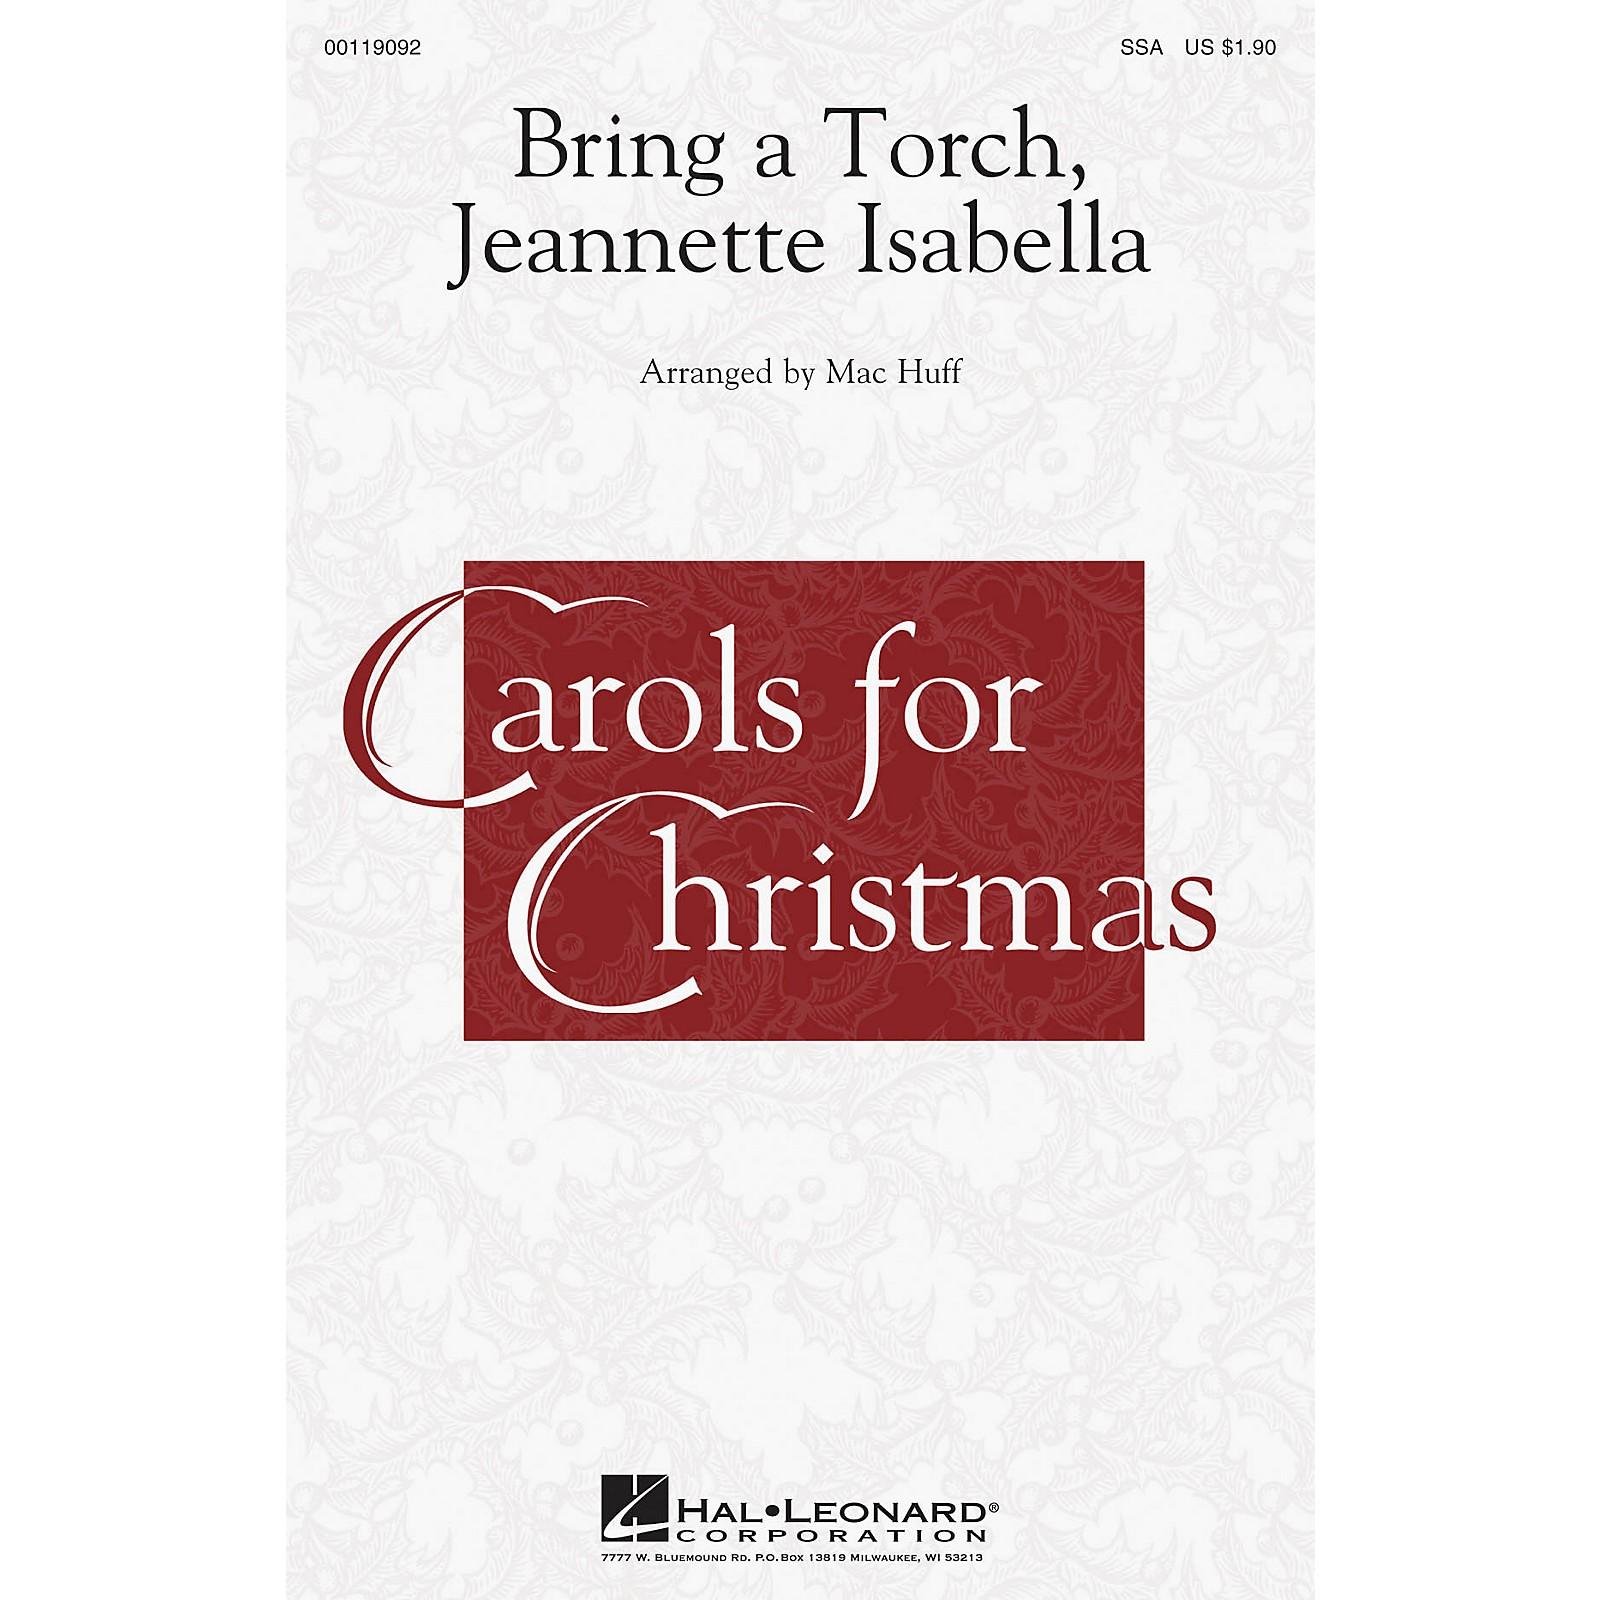 Hal Leonard Bring a Torch, Jeannette Isabella SSA arranged by Mac Huff